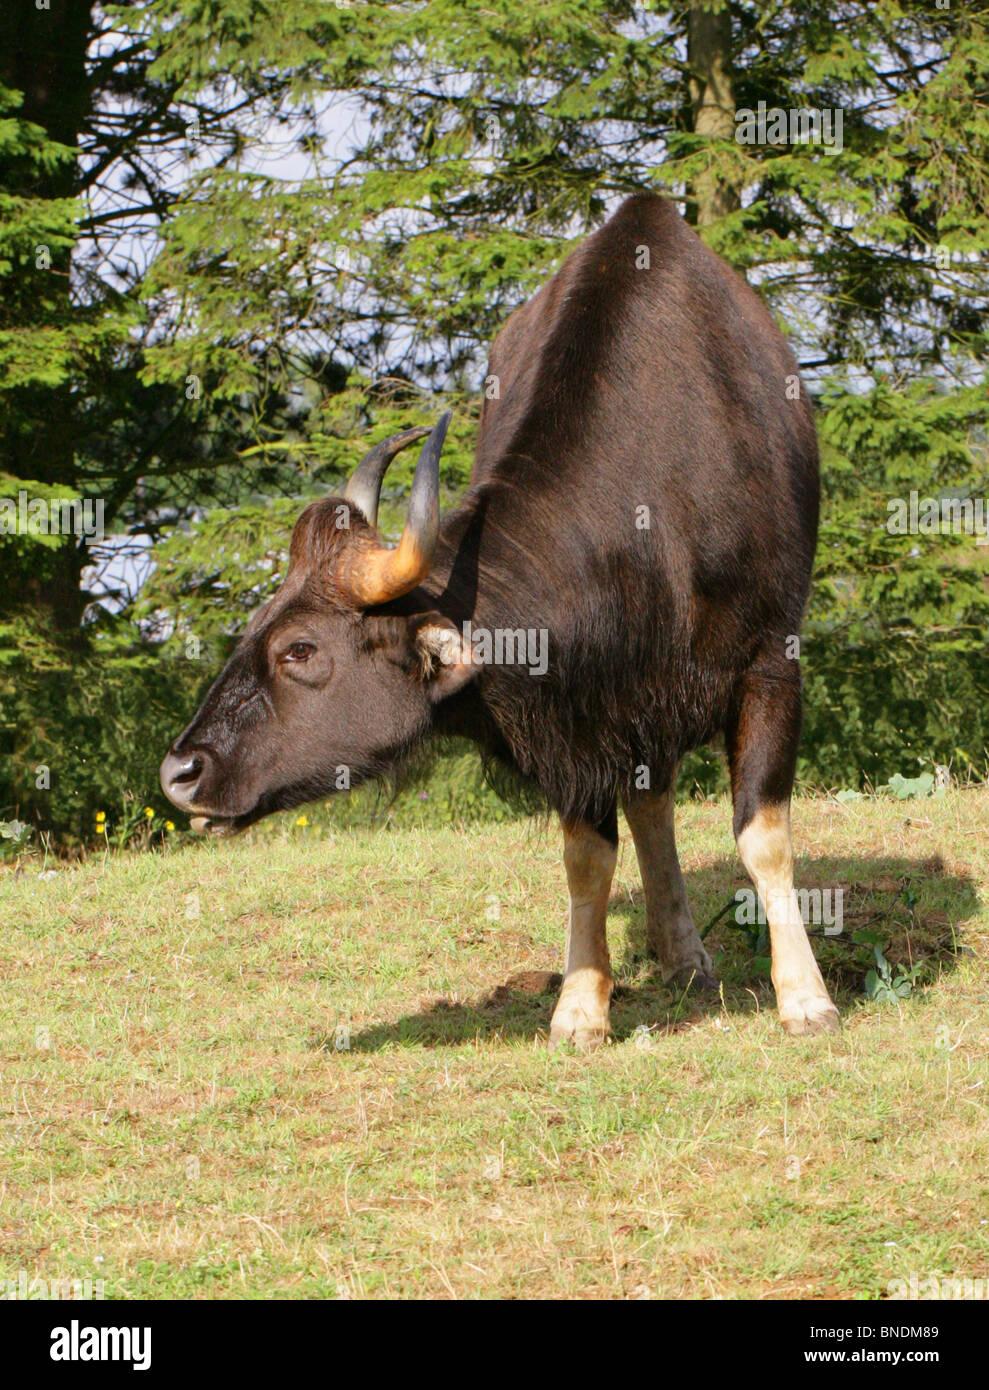 Male Gaur or Indian Bison, Bos gaurus (previously Bibos gauris), Bovinae, Bovidae. Large Asian Cattle. - Stock Image